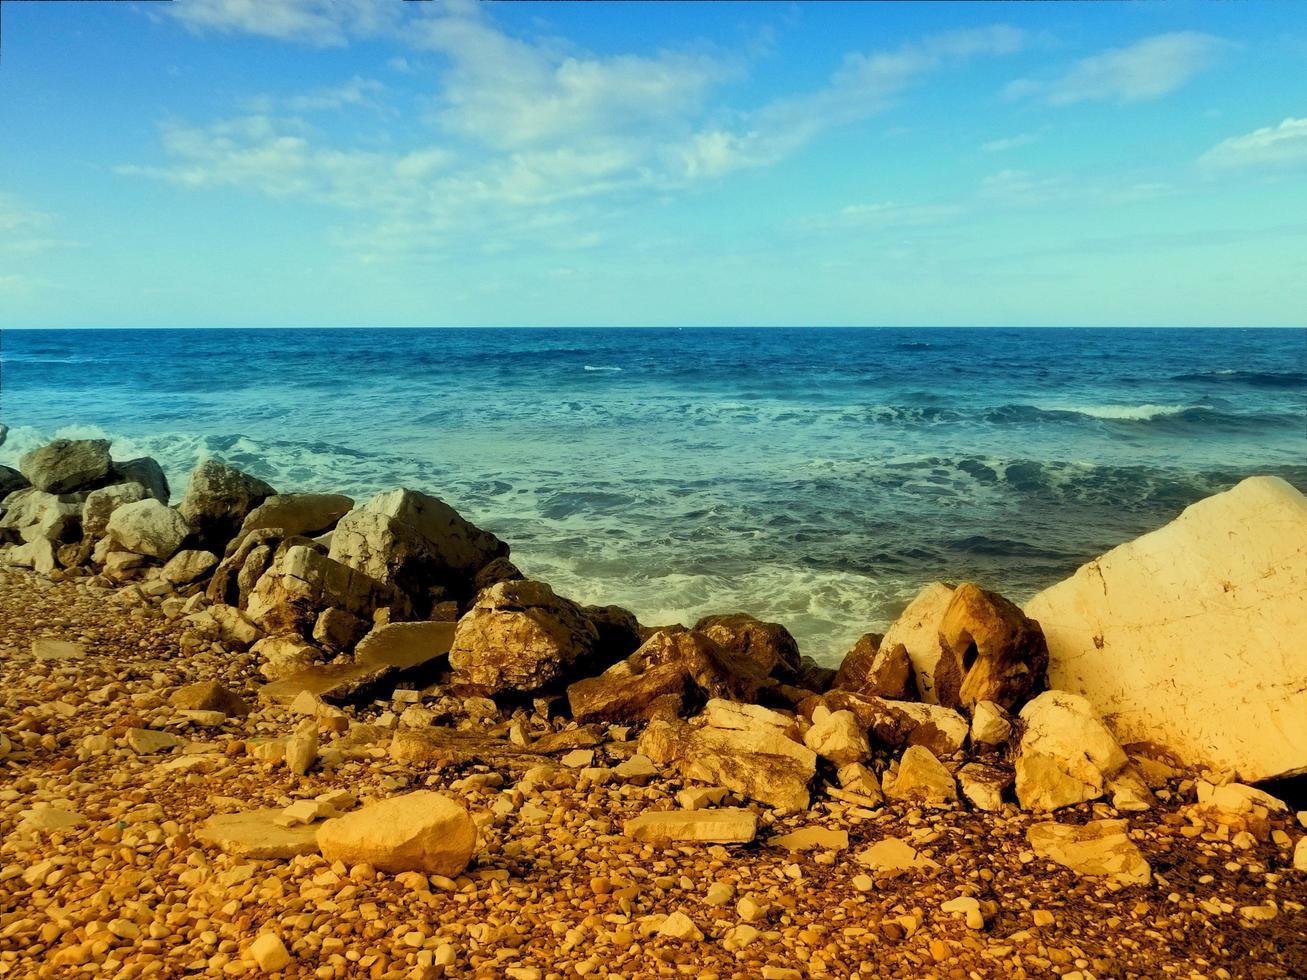 texture de la mer en plein air photo